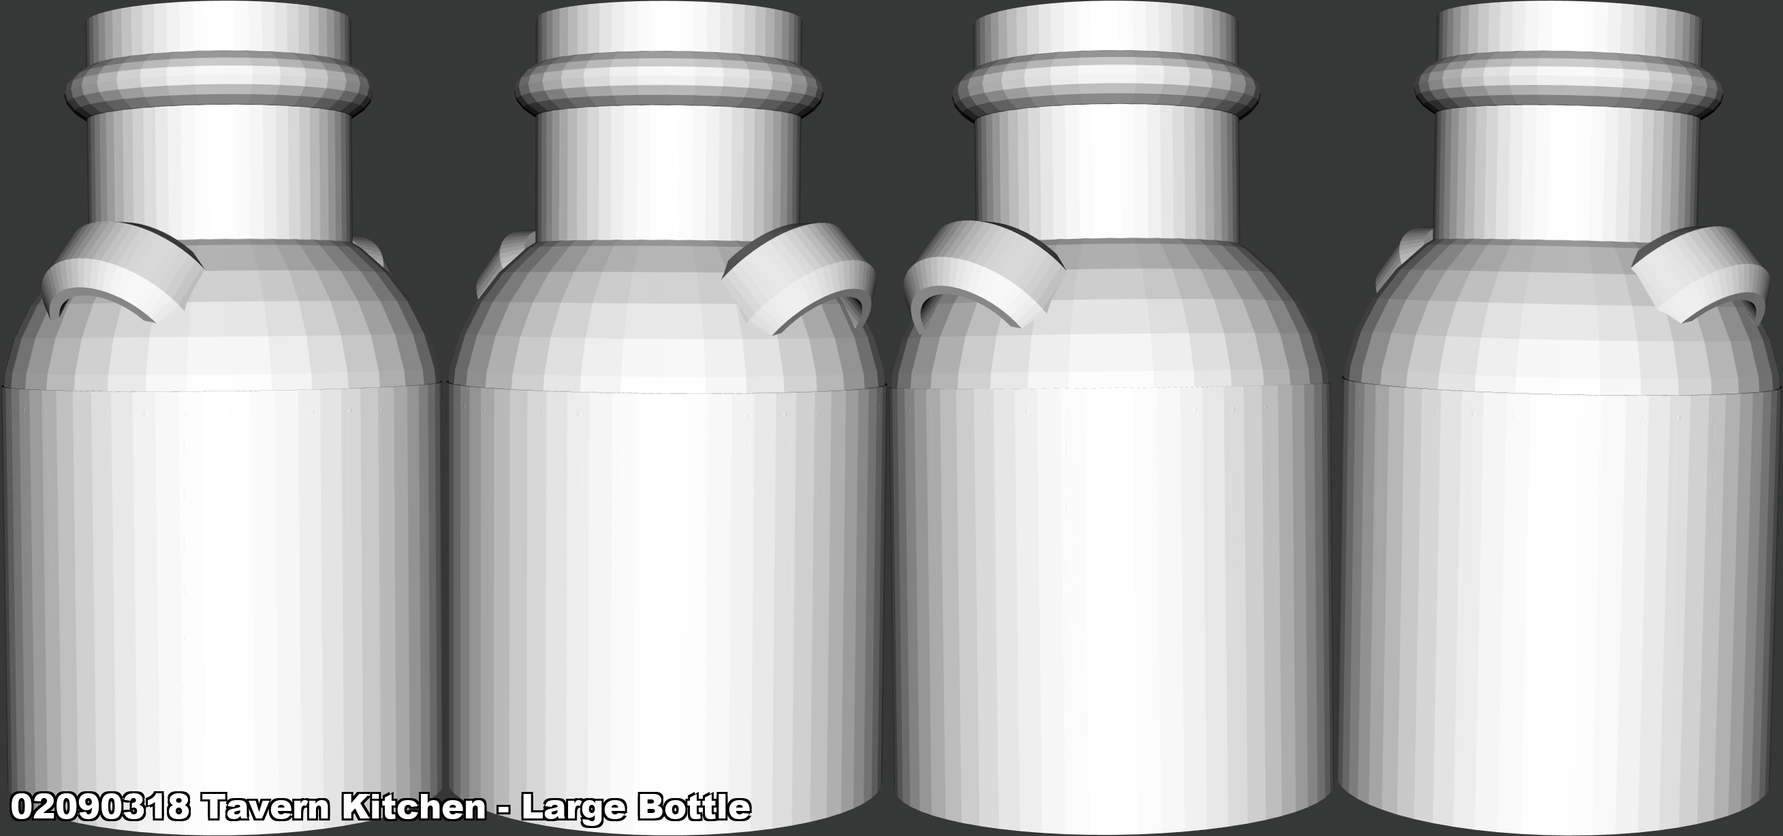 02090318 Tavern Kitchen - Large Bottle.p